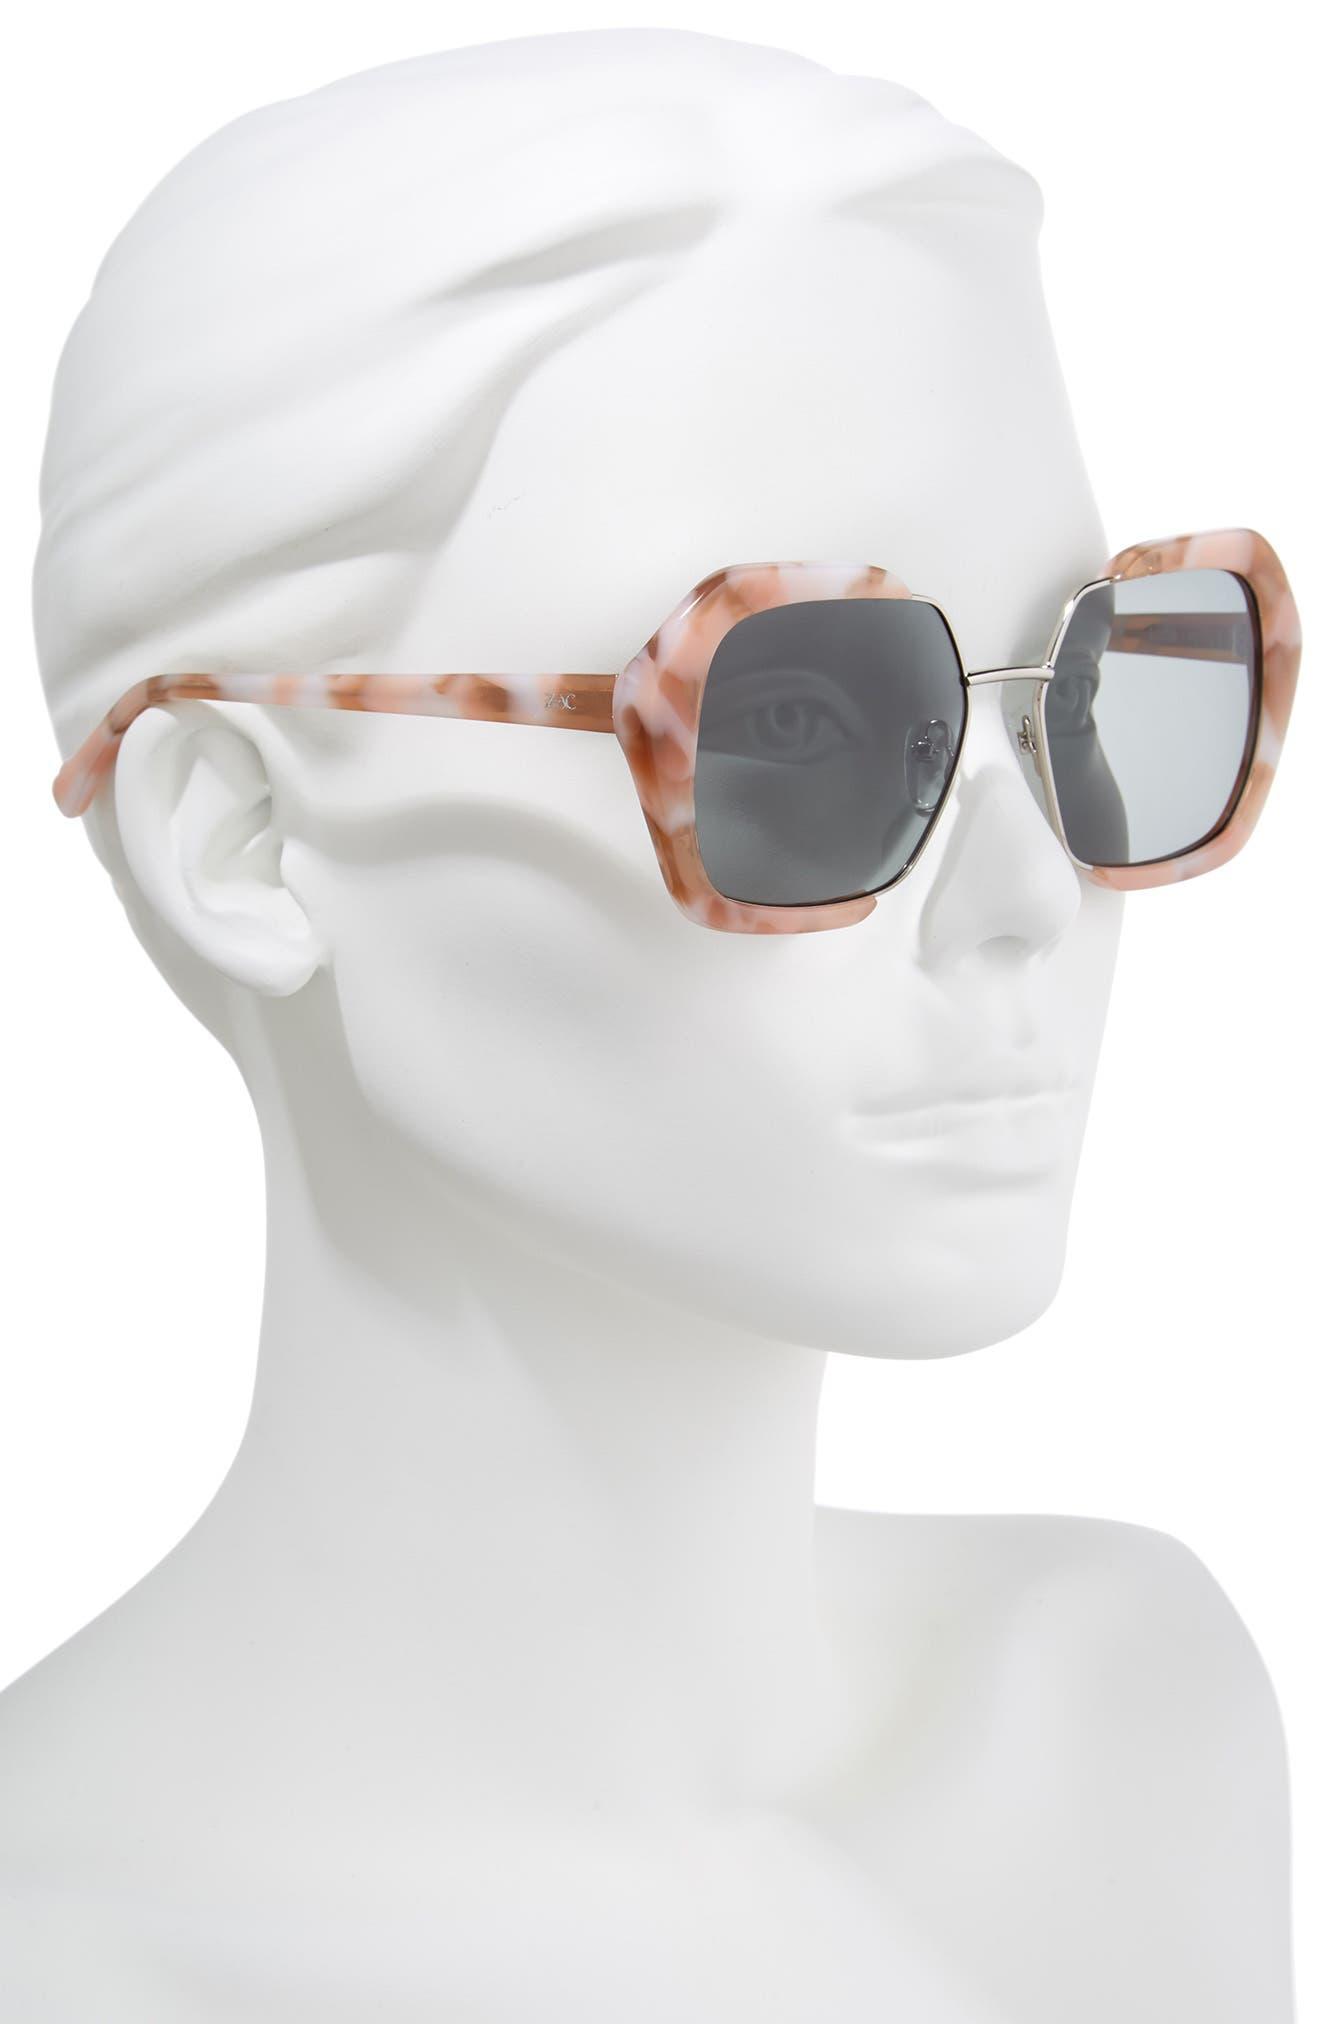 Isleen 55mm Polarized Sunglasses,                             Alternate thumbnail 2, color,                             Pink/ Tortoise/ Gold